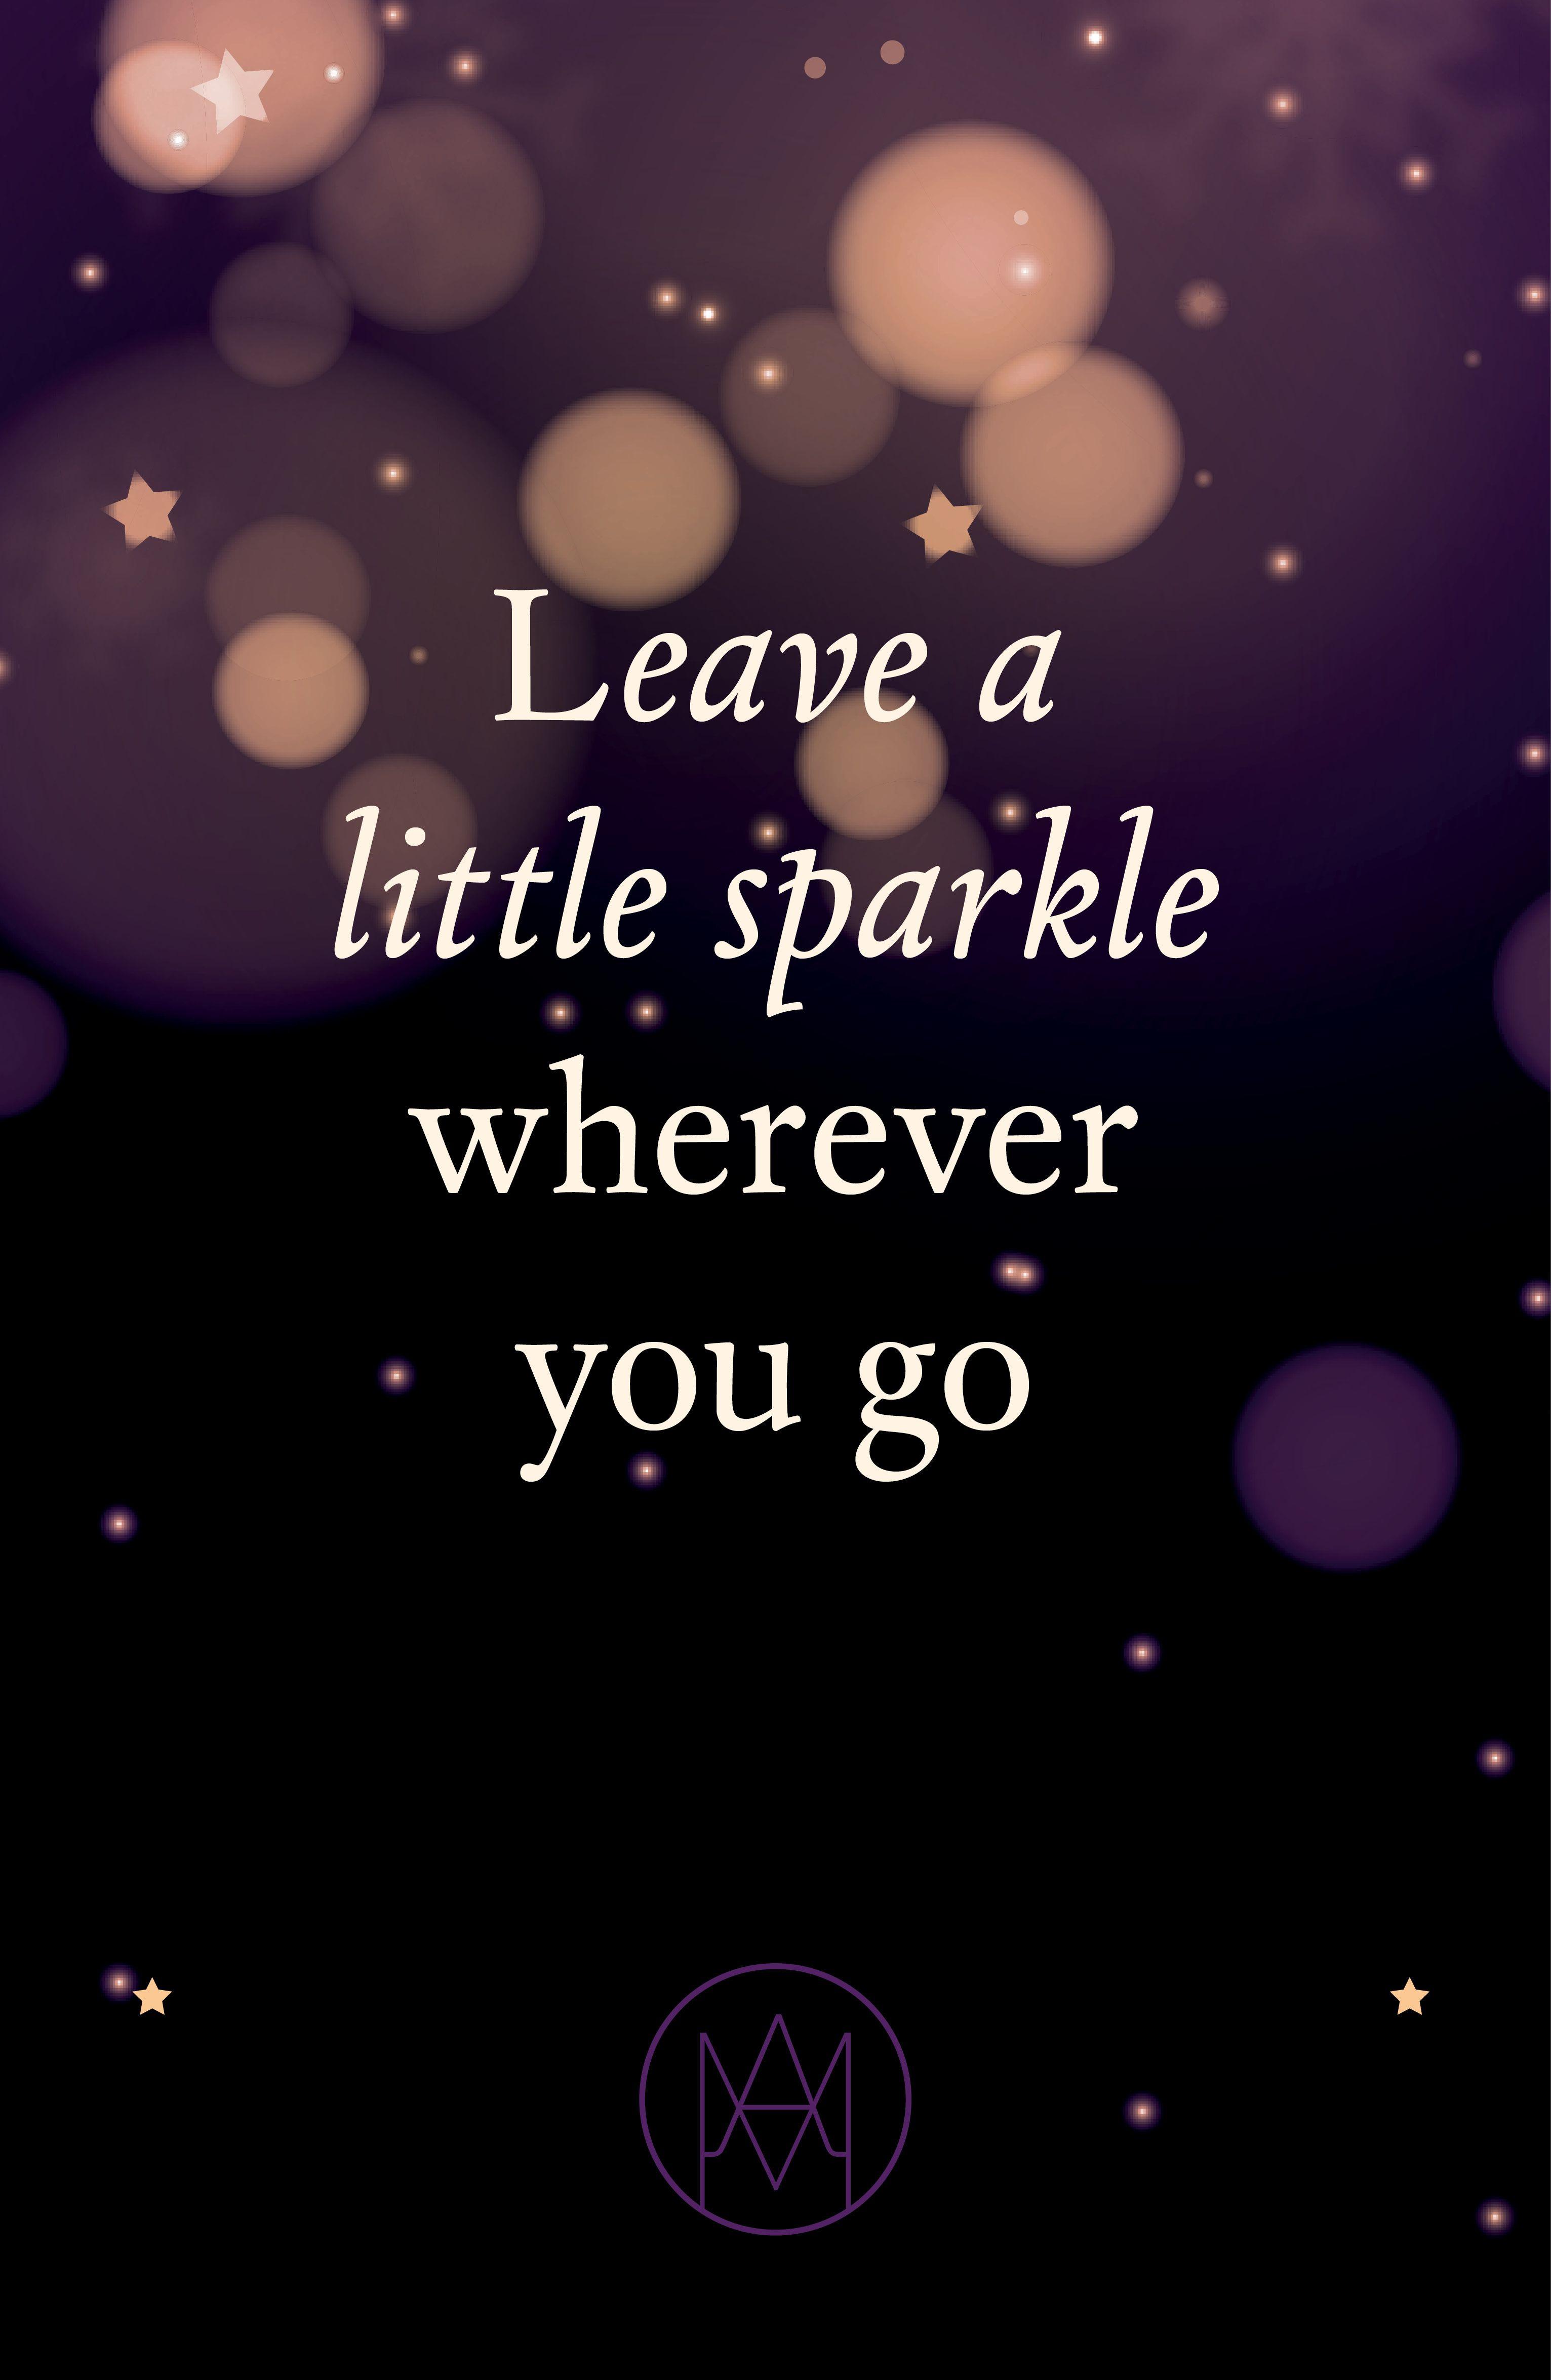 Merry Christmas Leave A Little Sparkle Wherever You Go